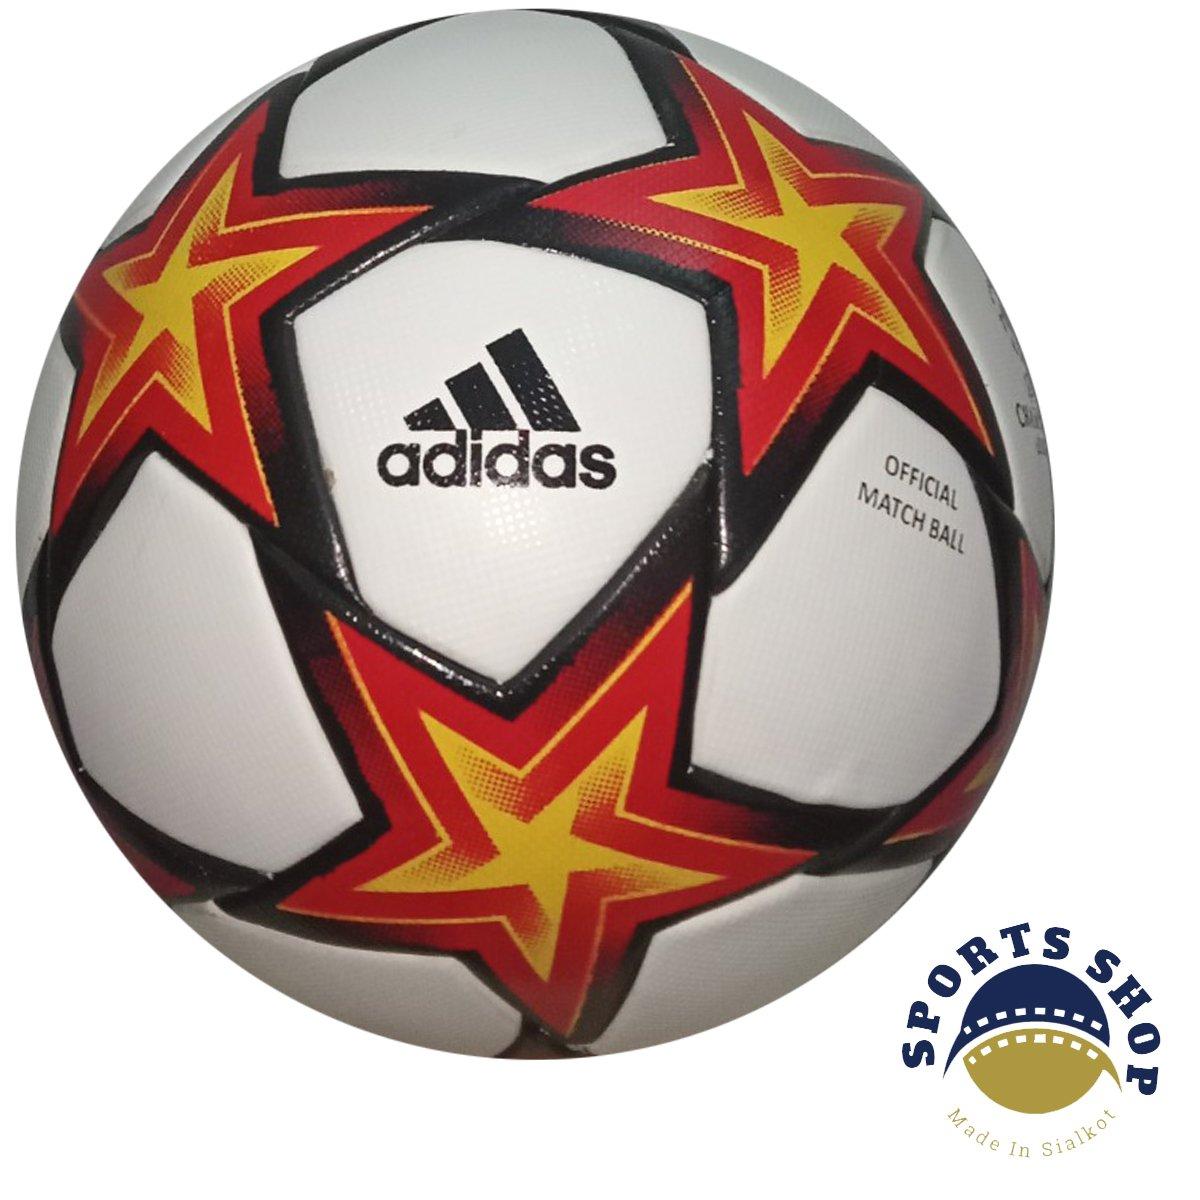 Adidas Football UCL Pro Pyrostorm Ball CHAMPIONS LEAGUE SOCCER MATCH BALL Size 5 Free Shipping